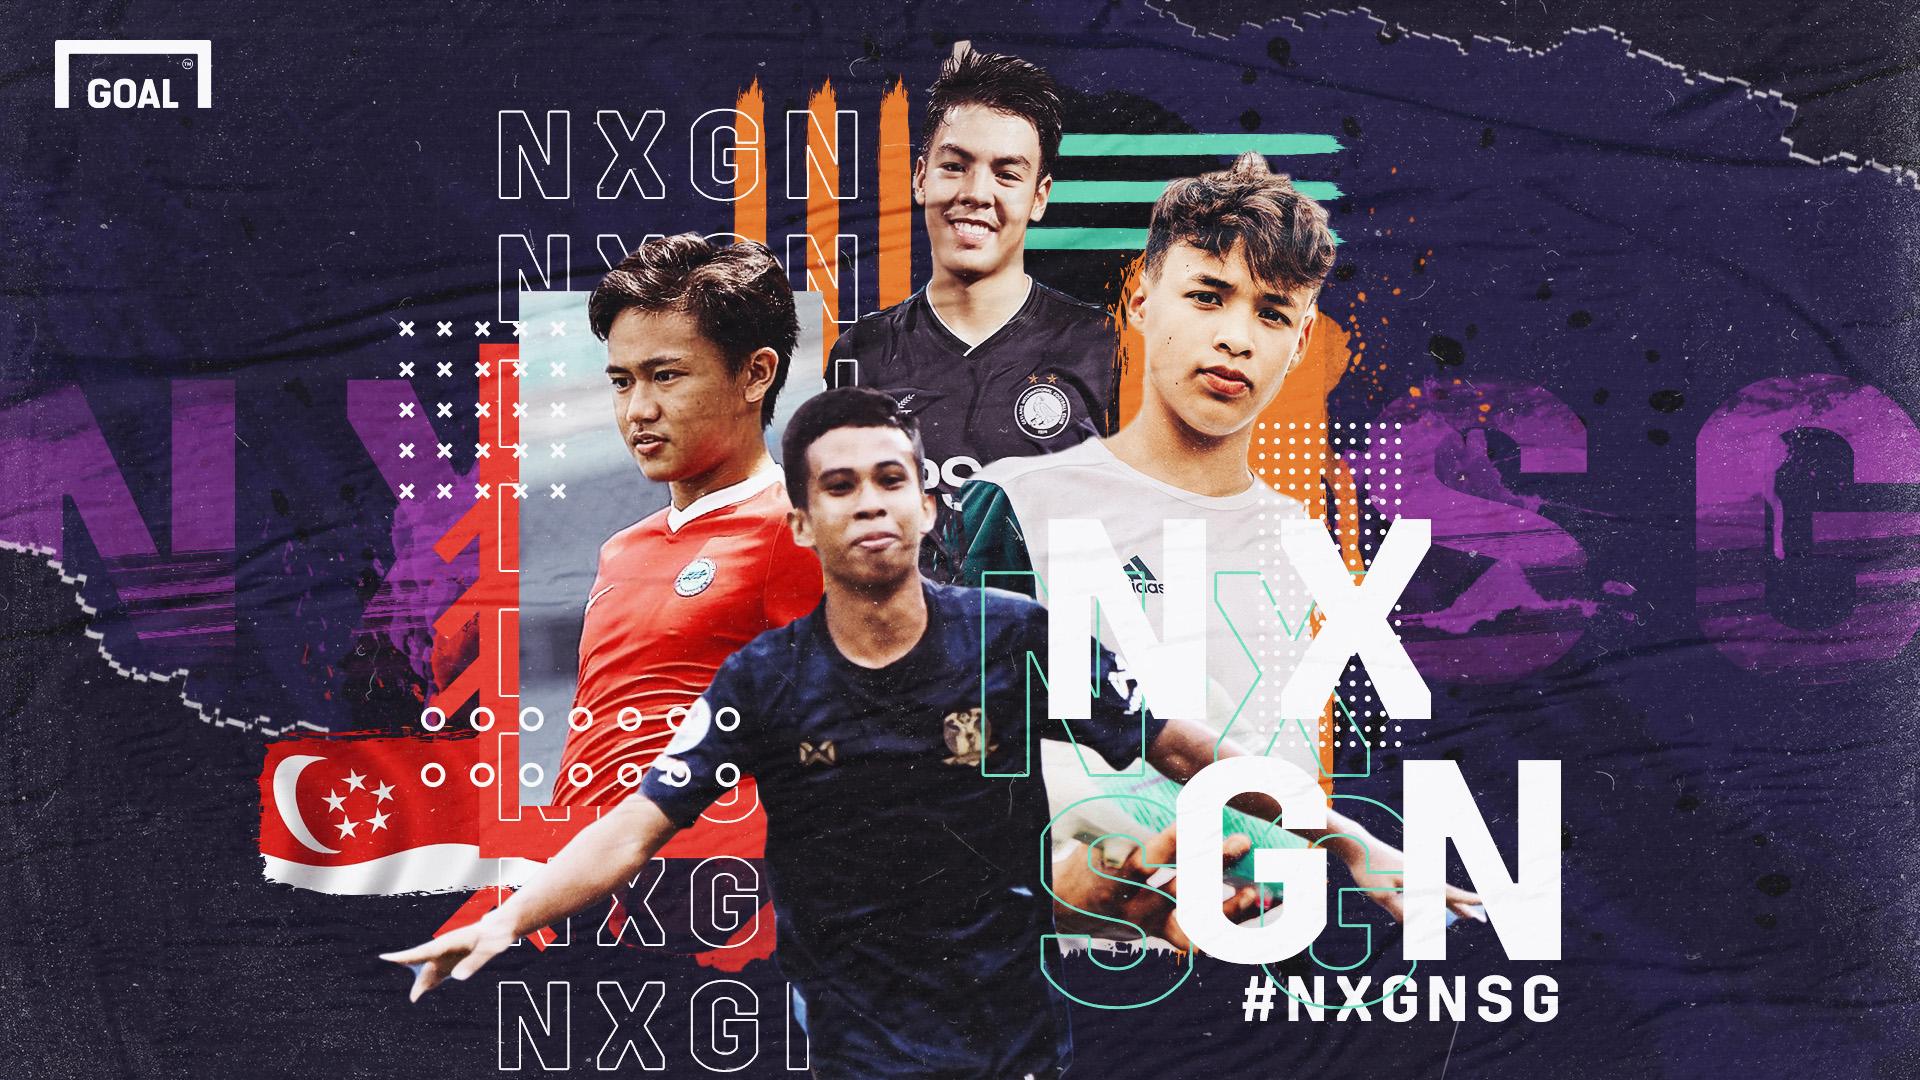 NxGn Singapore